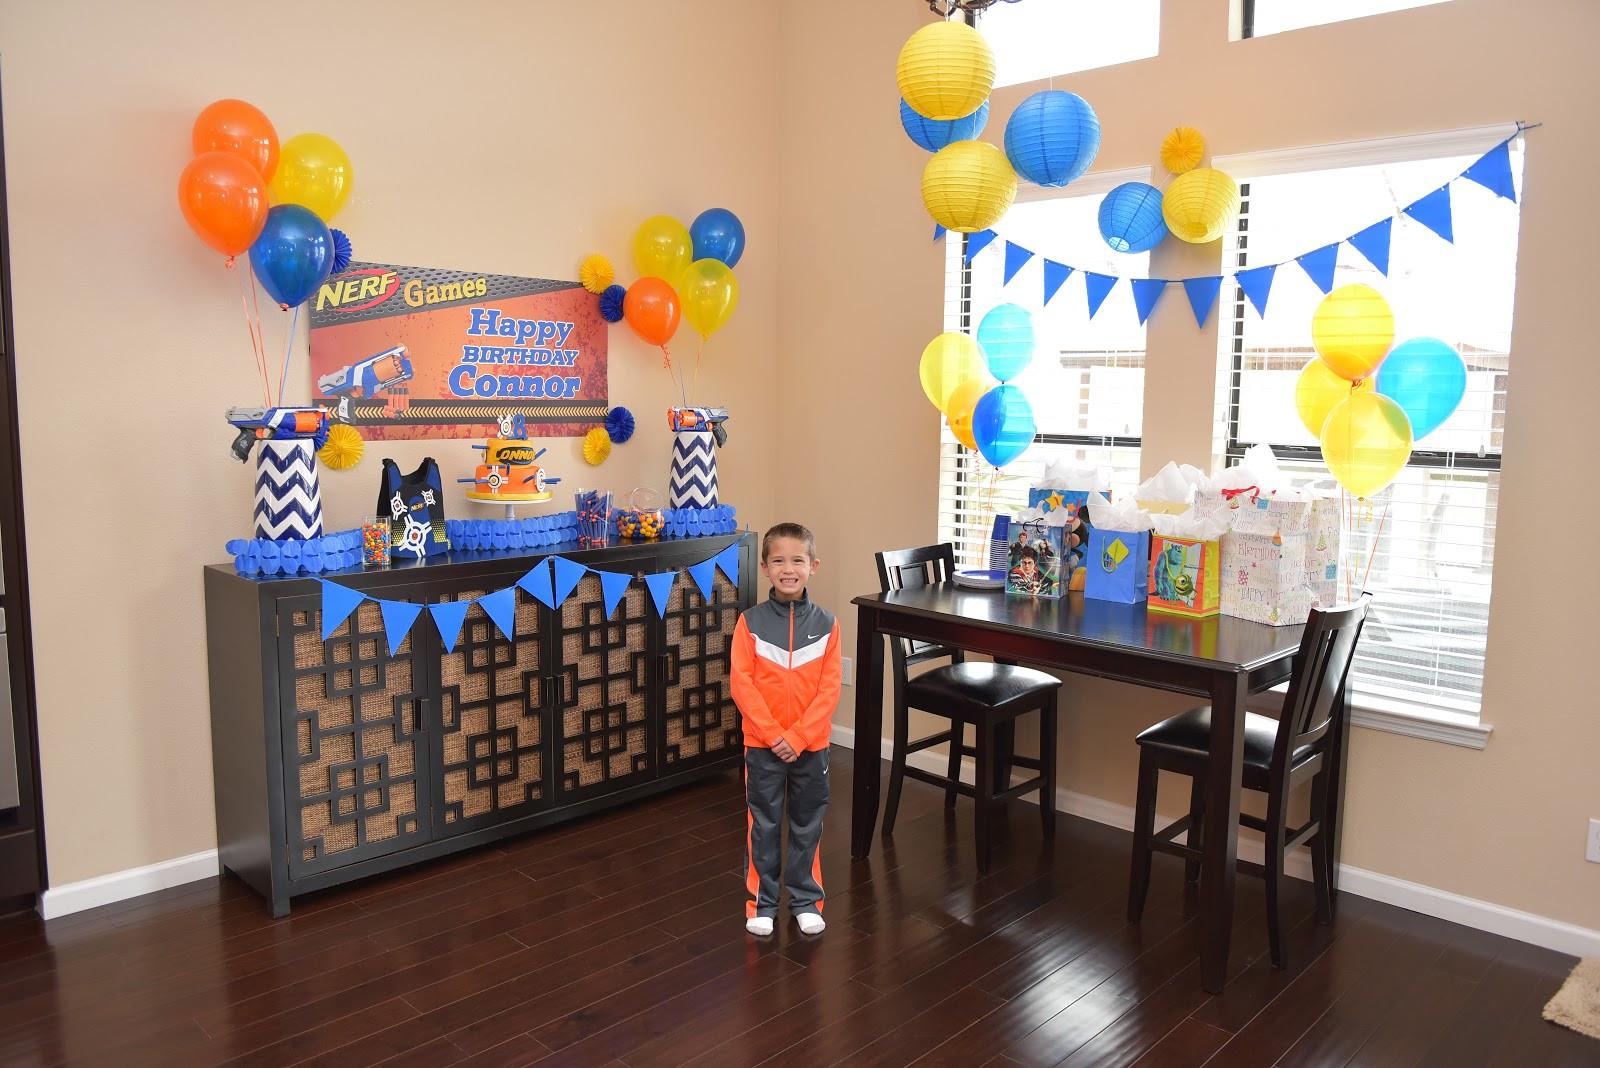 Nerf Birthday Party Decorations  Vernon Volumes Connor s 8th Birthday party Nerf Party